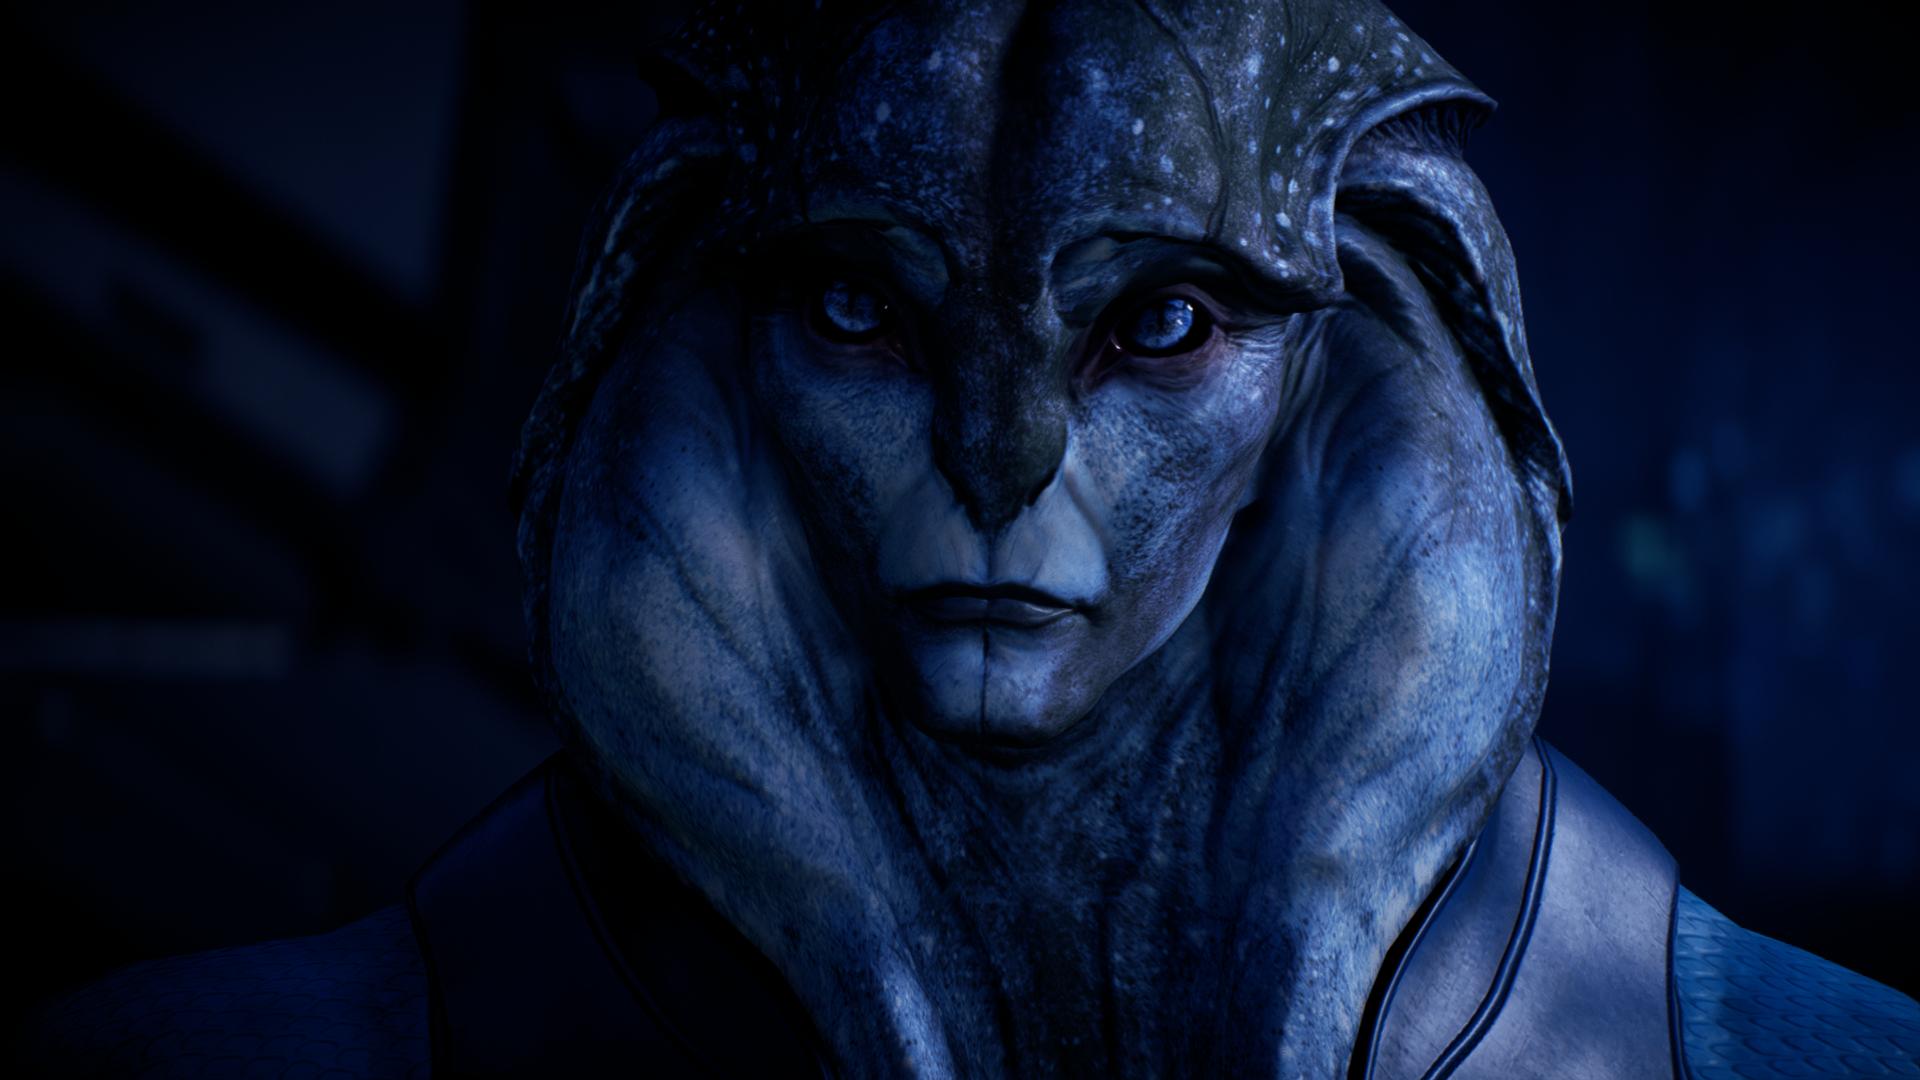 Mass Effect Andromeda_Cinetools_0004_JTC.png